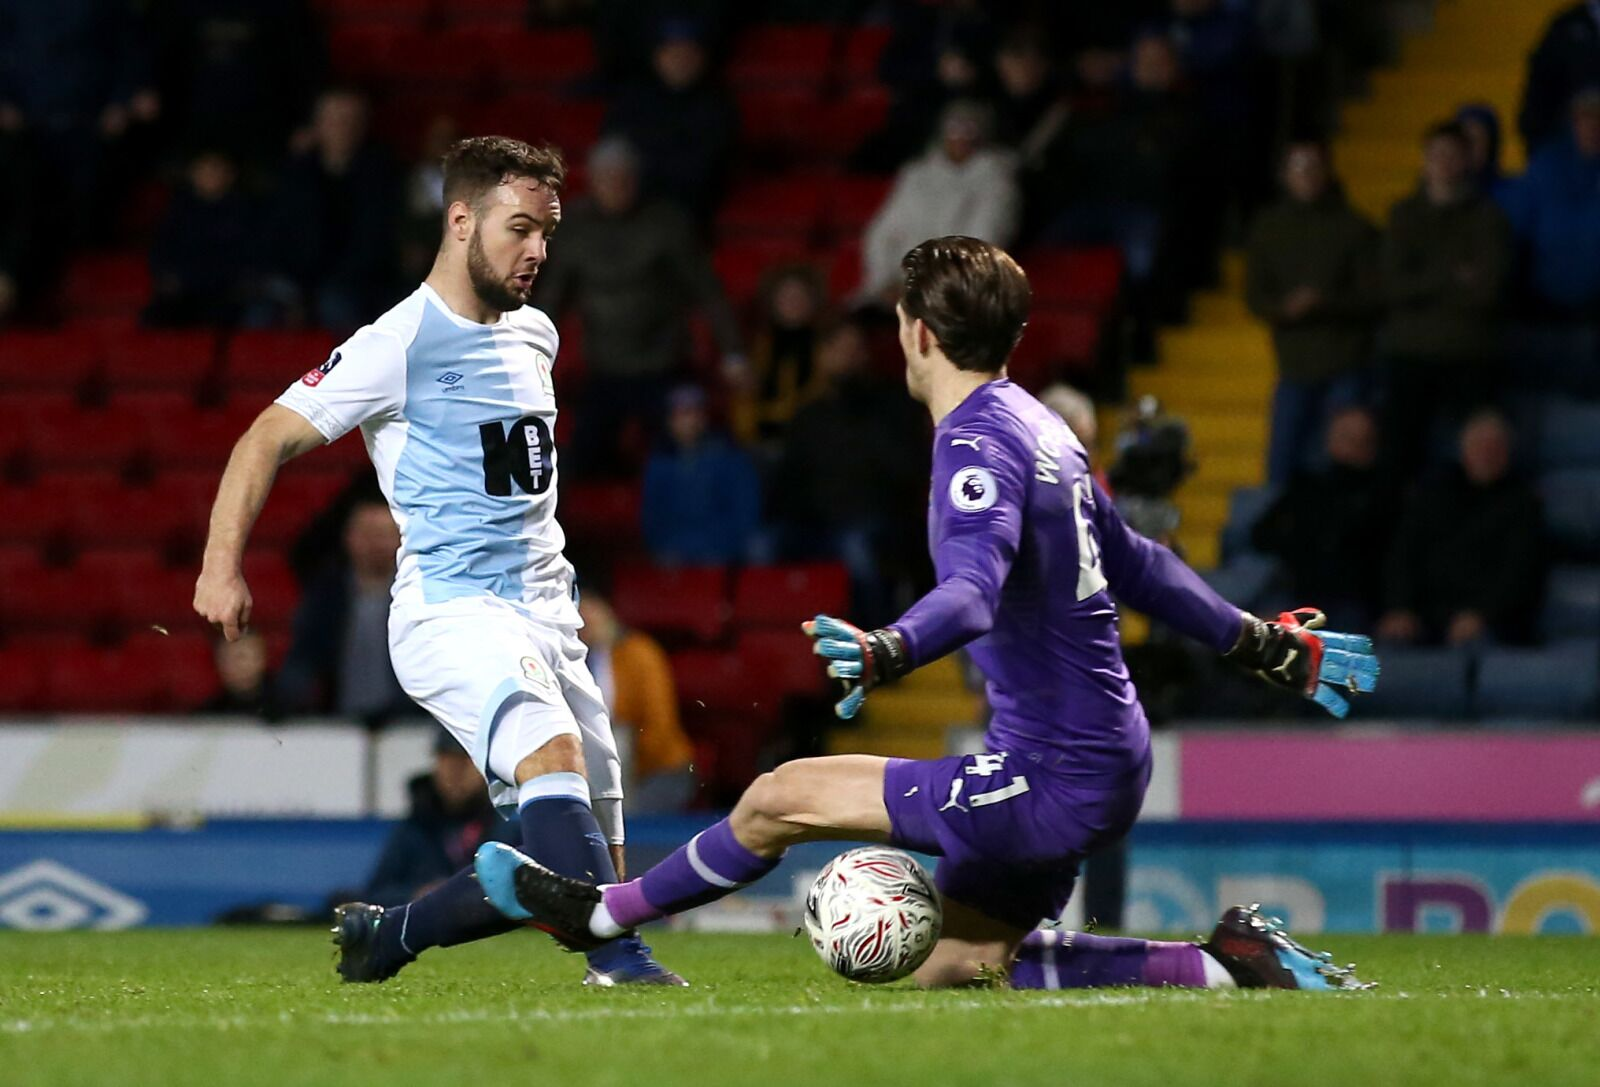 2018-19 Newcastle United player evaluation: Freddie Woodman